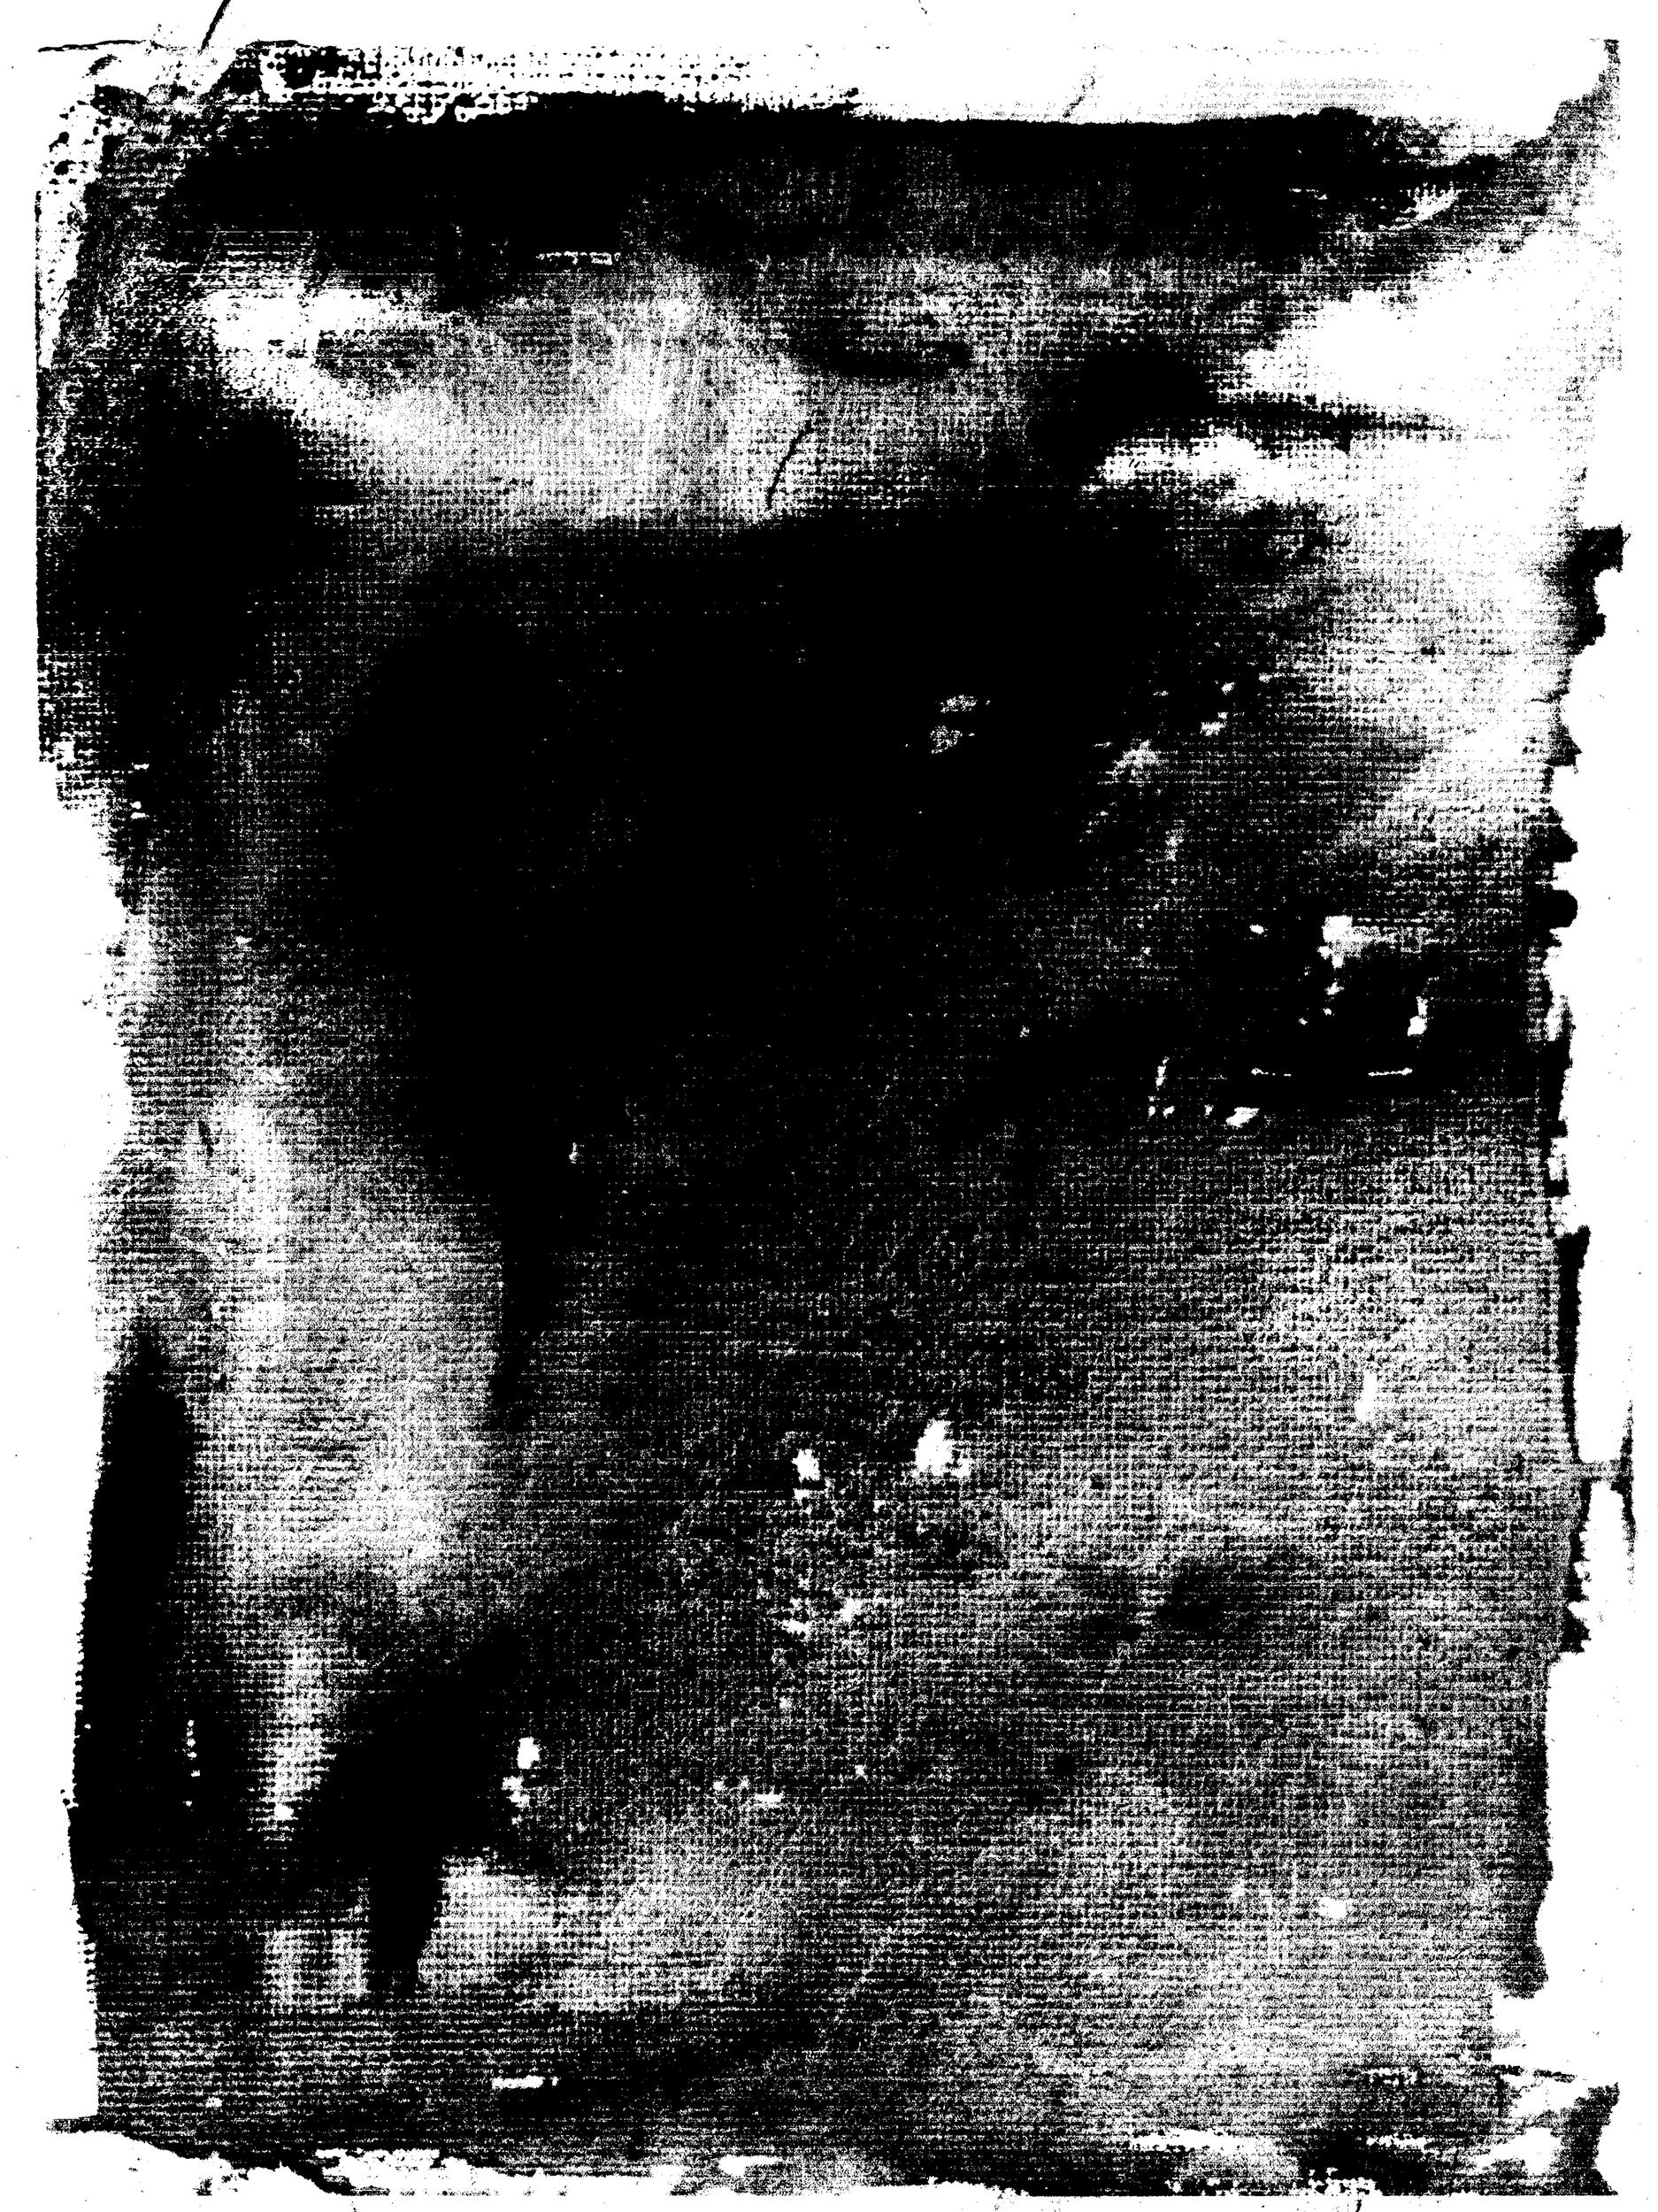 black paint on canvas texture by absurdwordpreferred on deviantart. Black Bedroom Furniture Sets. Home Design Ideas